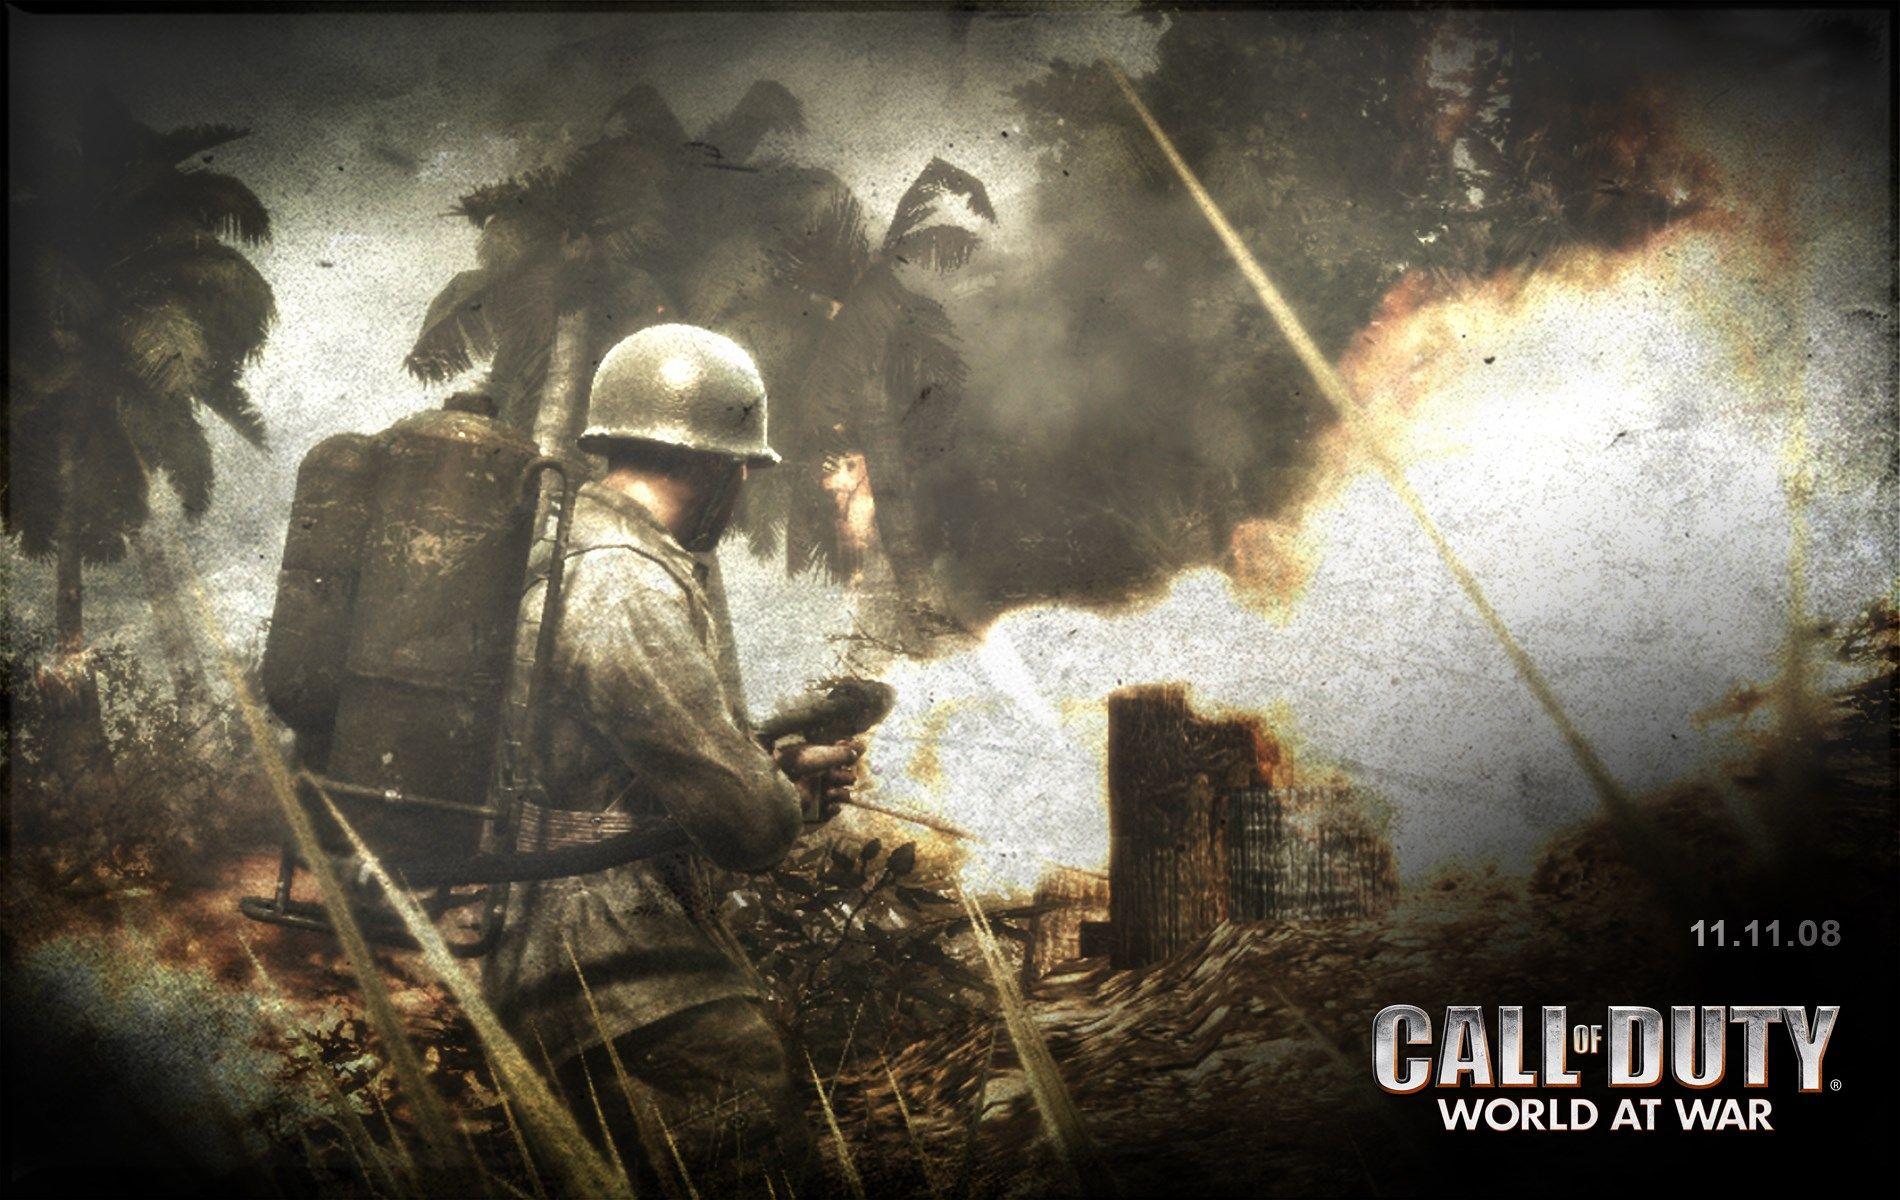 1900x1200 Call Of Duty World At War Game Wallpaper